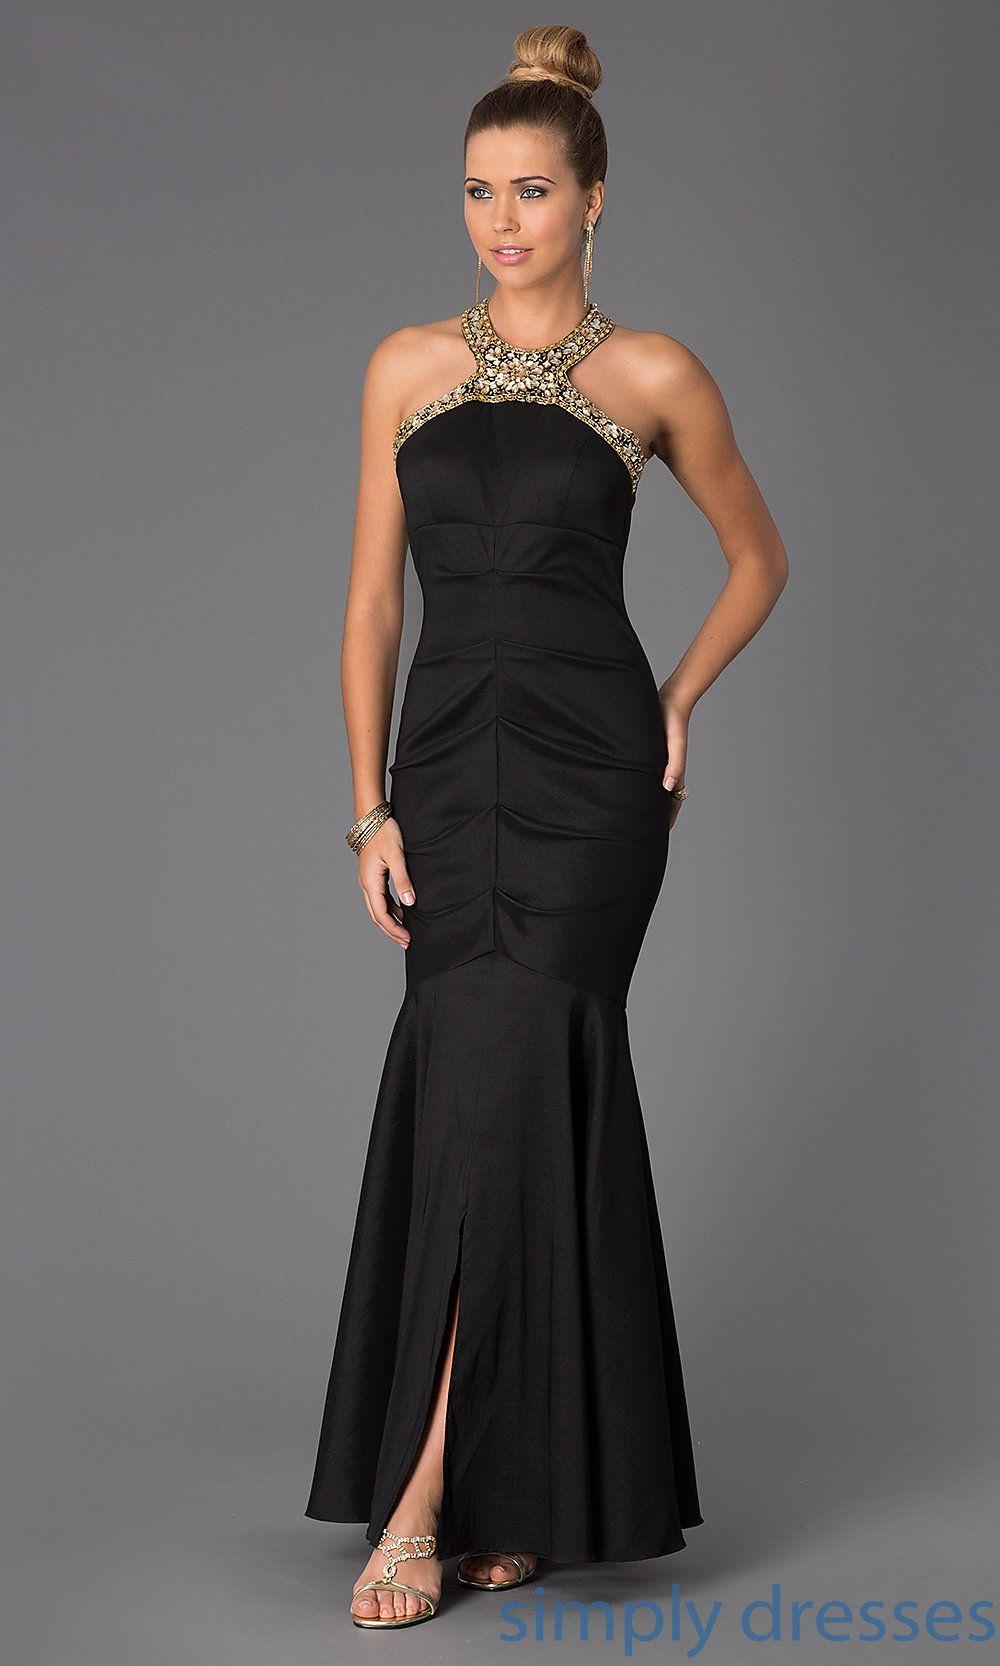 Dress floor length jewel embellished dress simply dresses